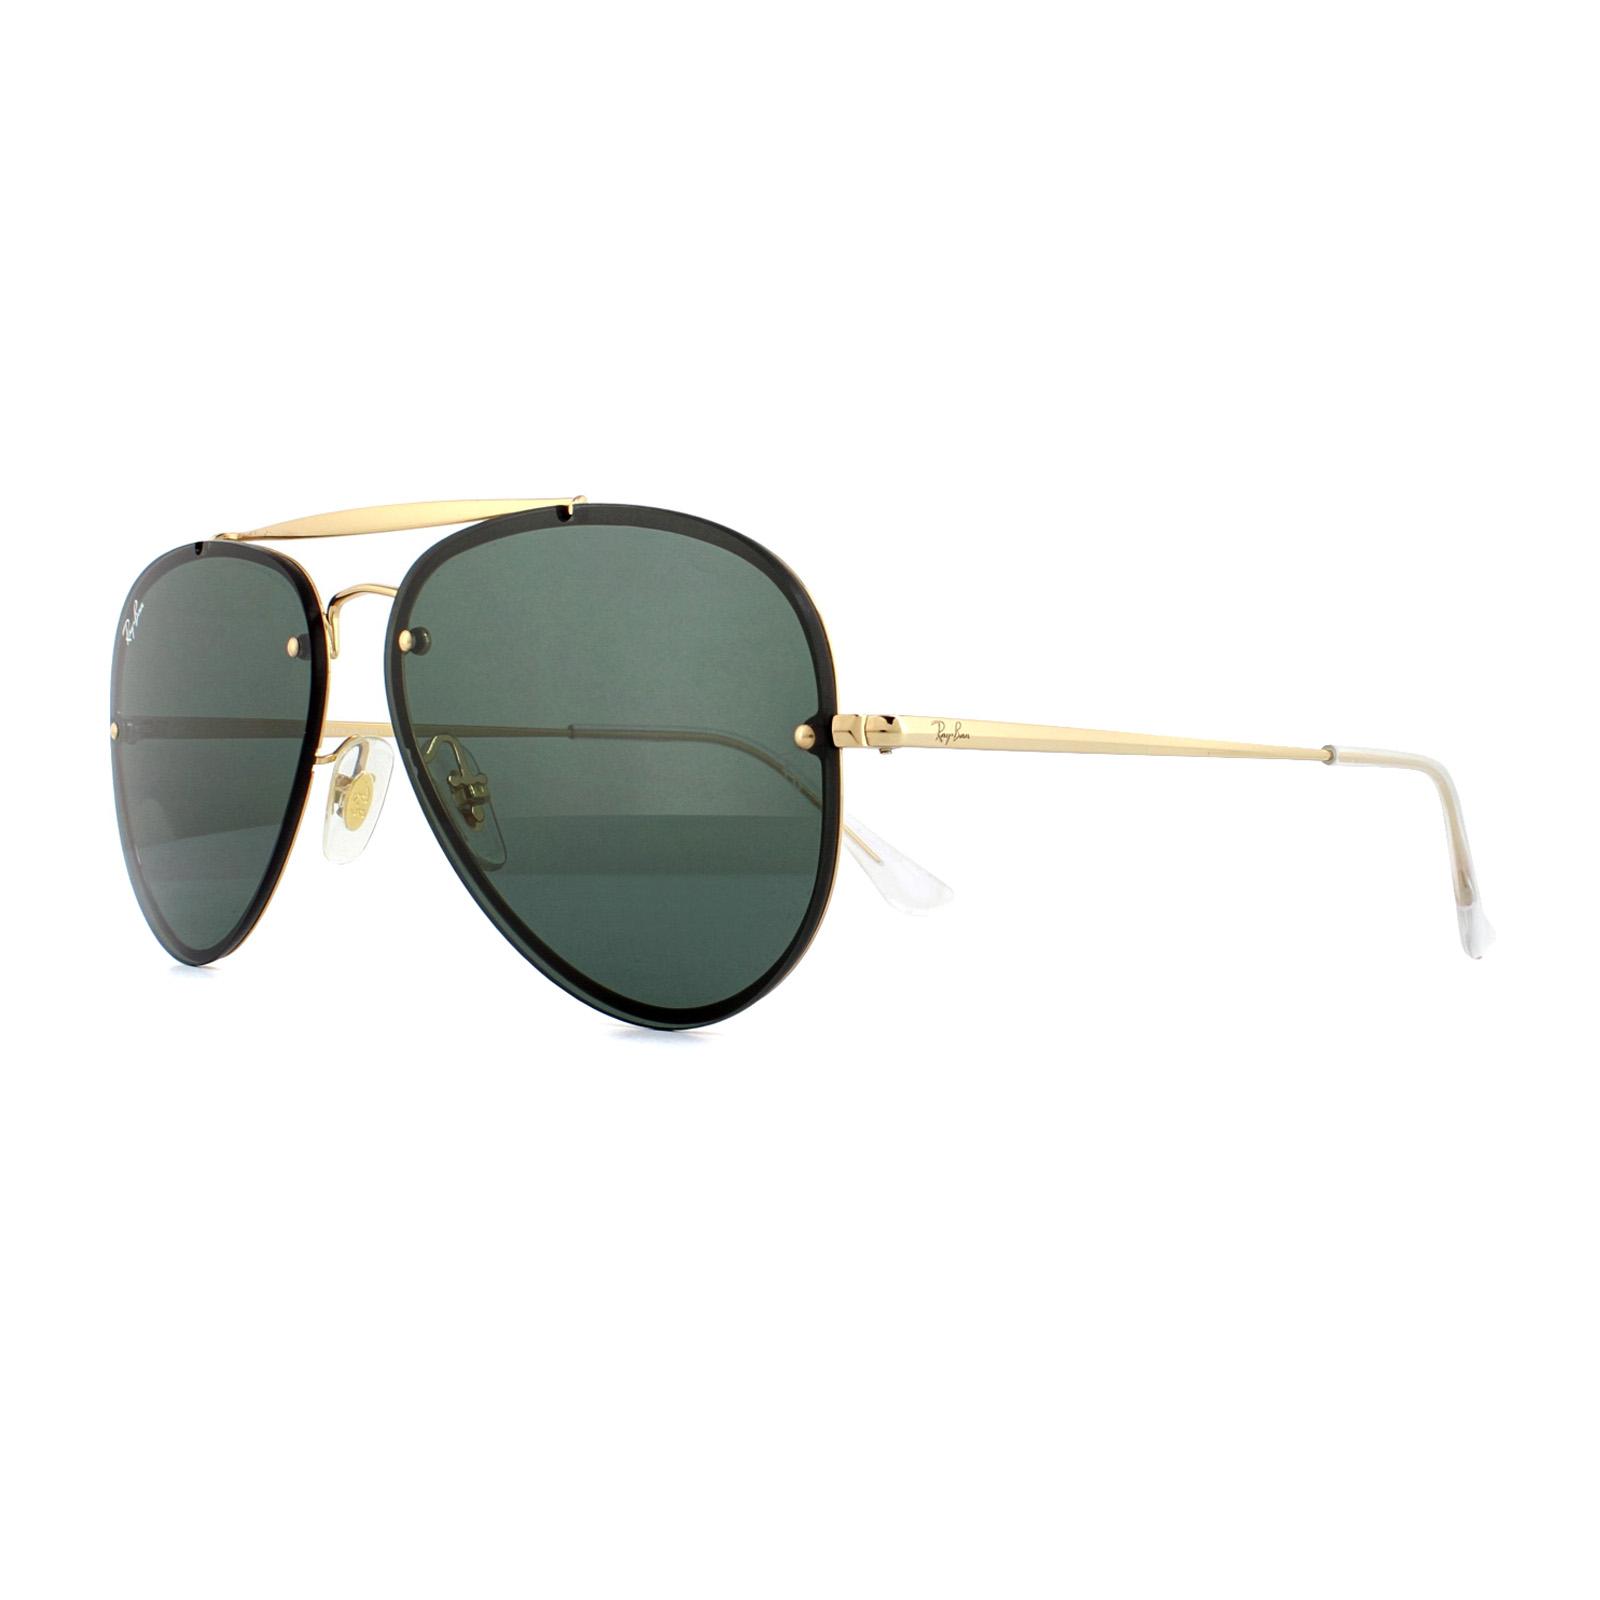 Sentinel Ray-Ban Sunglasses Blaze Aviator 3584N 905071 Gold Dark Green 58mm 3a91c76e25